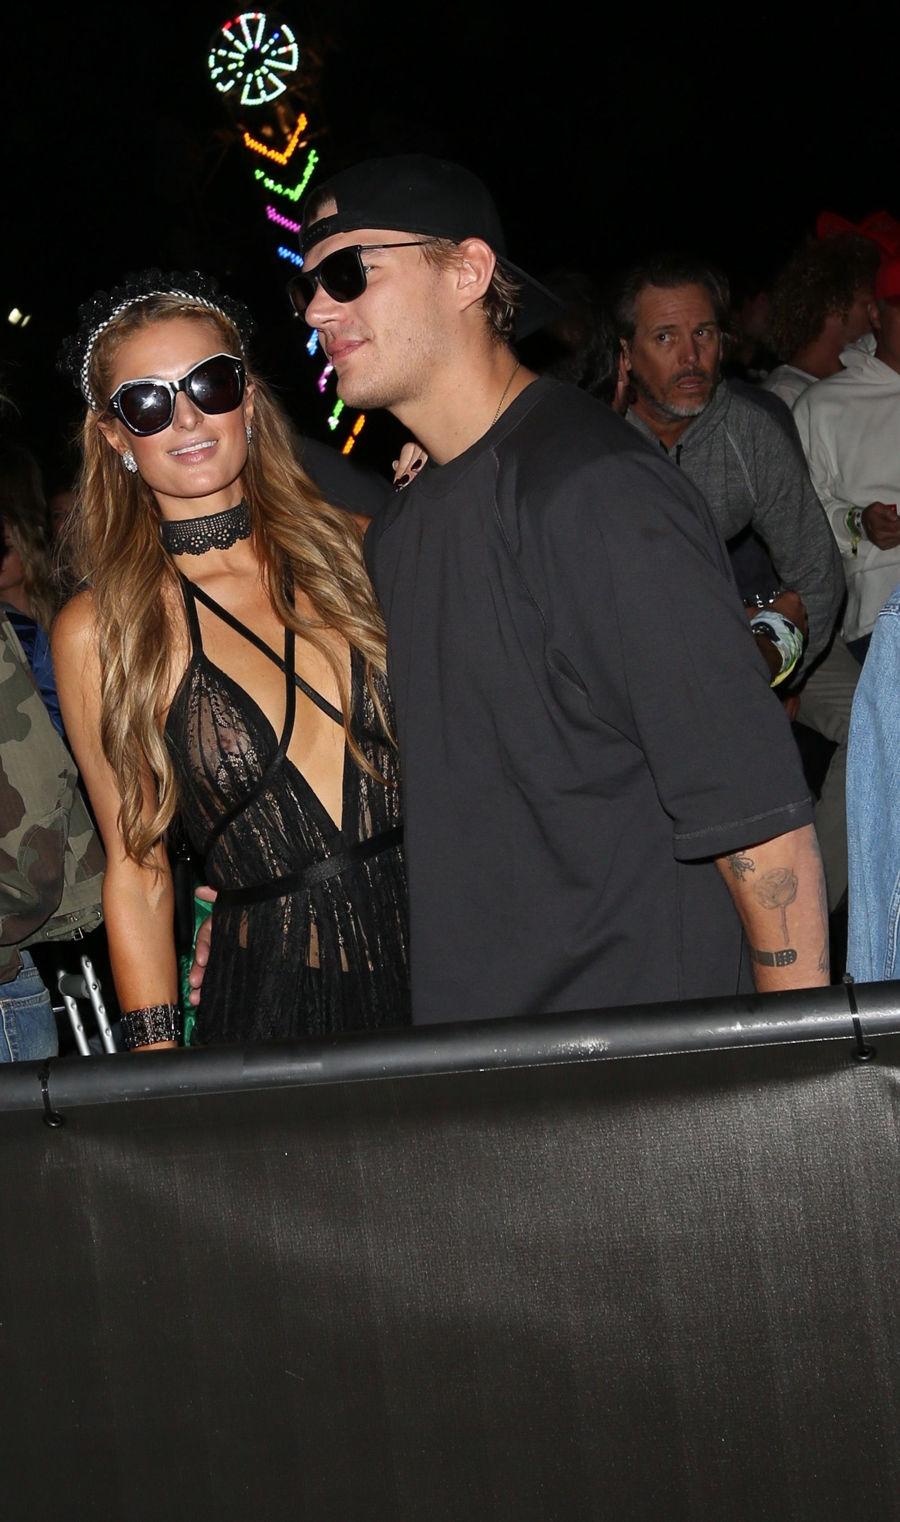 Se filtran fotos de desnudos de Lindsay Lohan en The